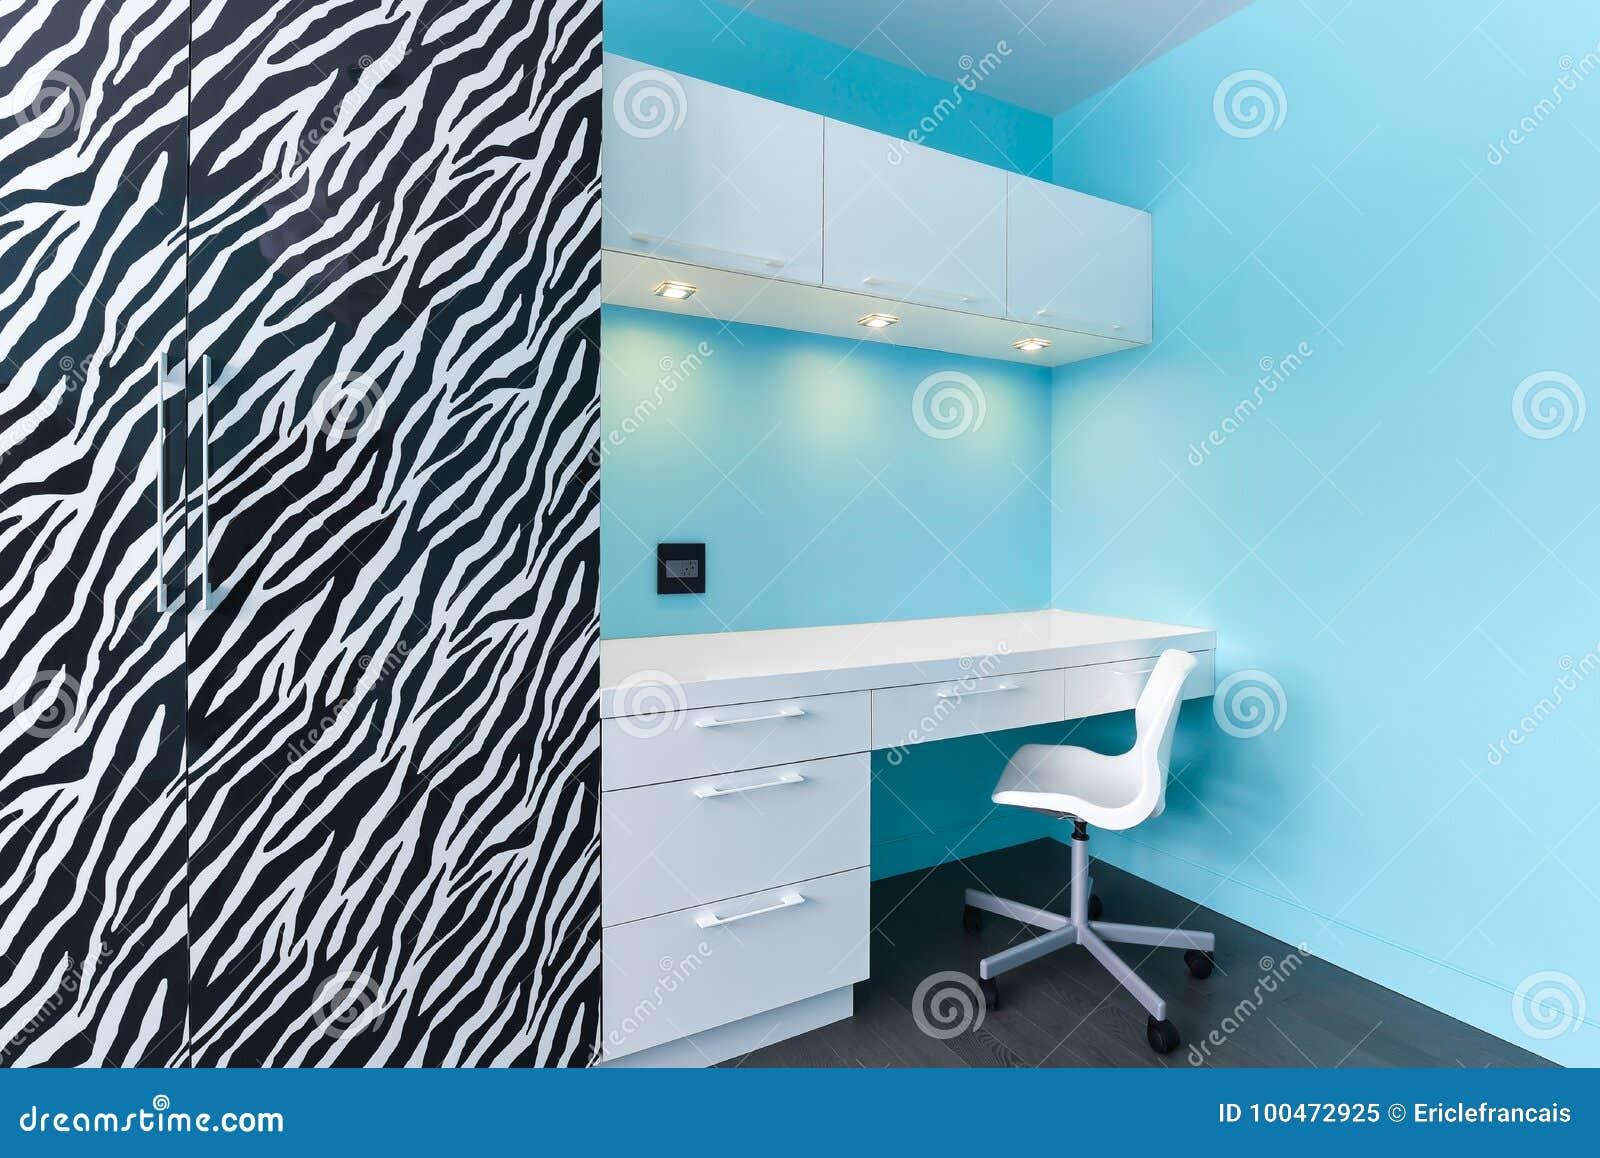 Zebra And White Cabinets Study Desk